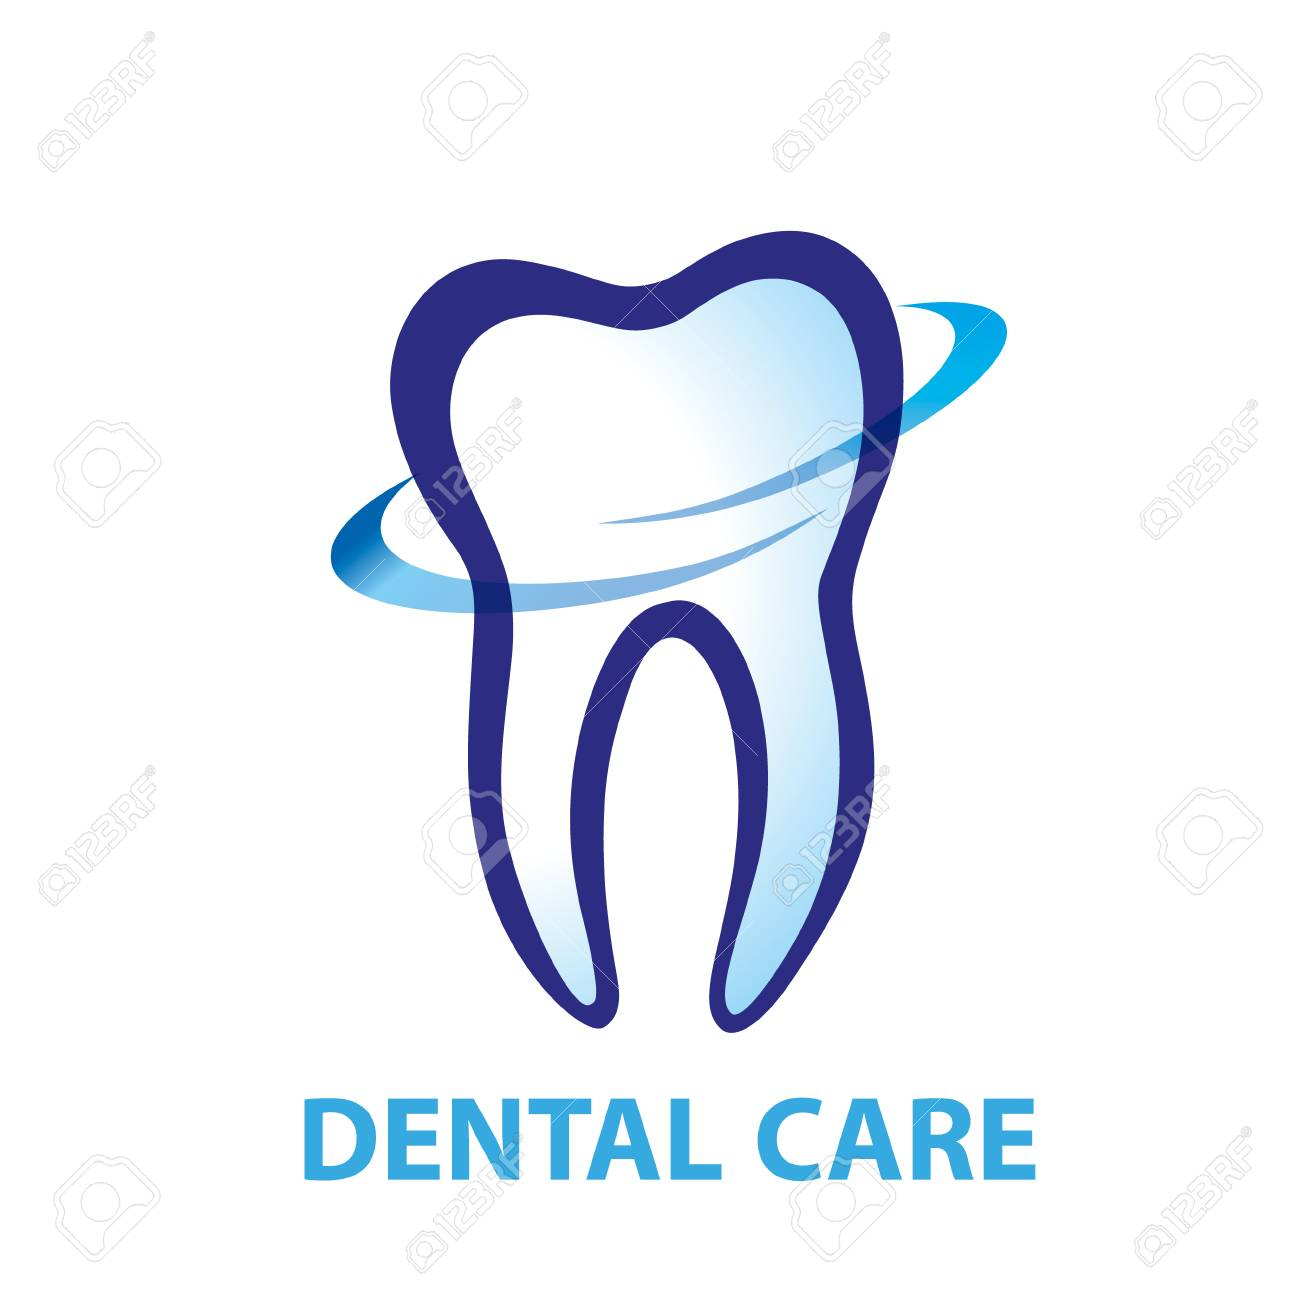 Health Dent Logo Design Vector Cosmetic Dental Dentistry Dental Royalty Free Cliparts Vectors And Stock Illustration Image 91096825